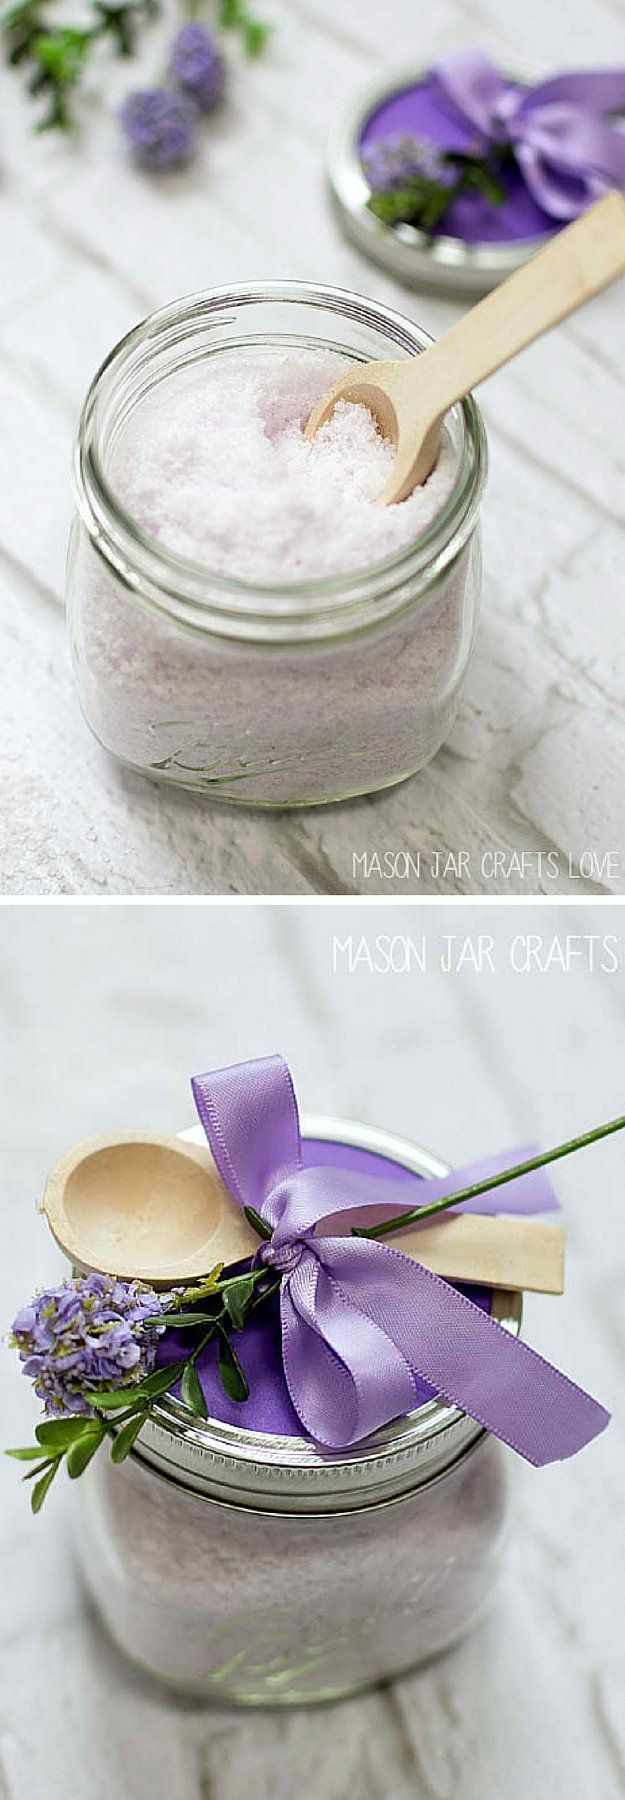 Lavender Mint Bath Salts   17 DIY Bath Salts   Learn How To Make The Most Relaxing Bath Salt Recipes by DIY Ready at  http://diyready.com/17-diy-bath-salts-bath-salt-recipe/